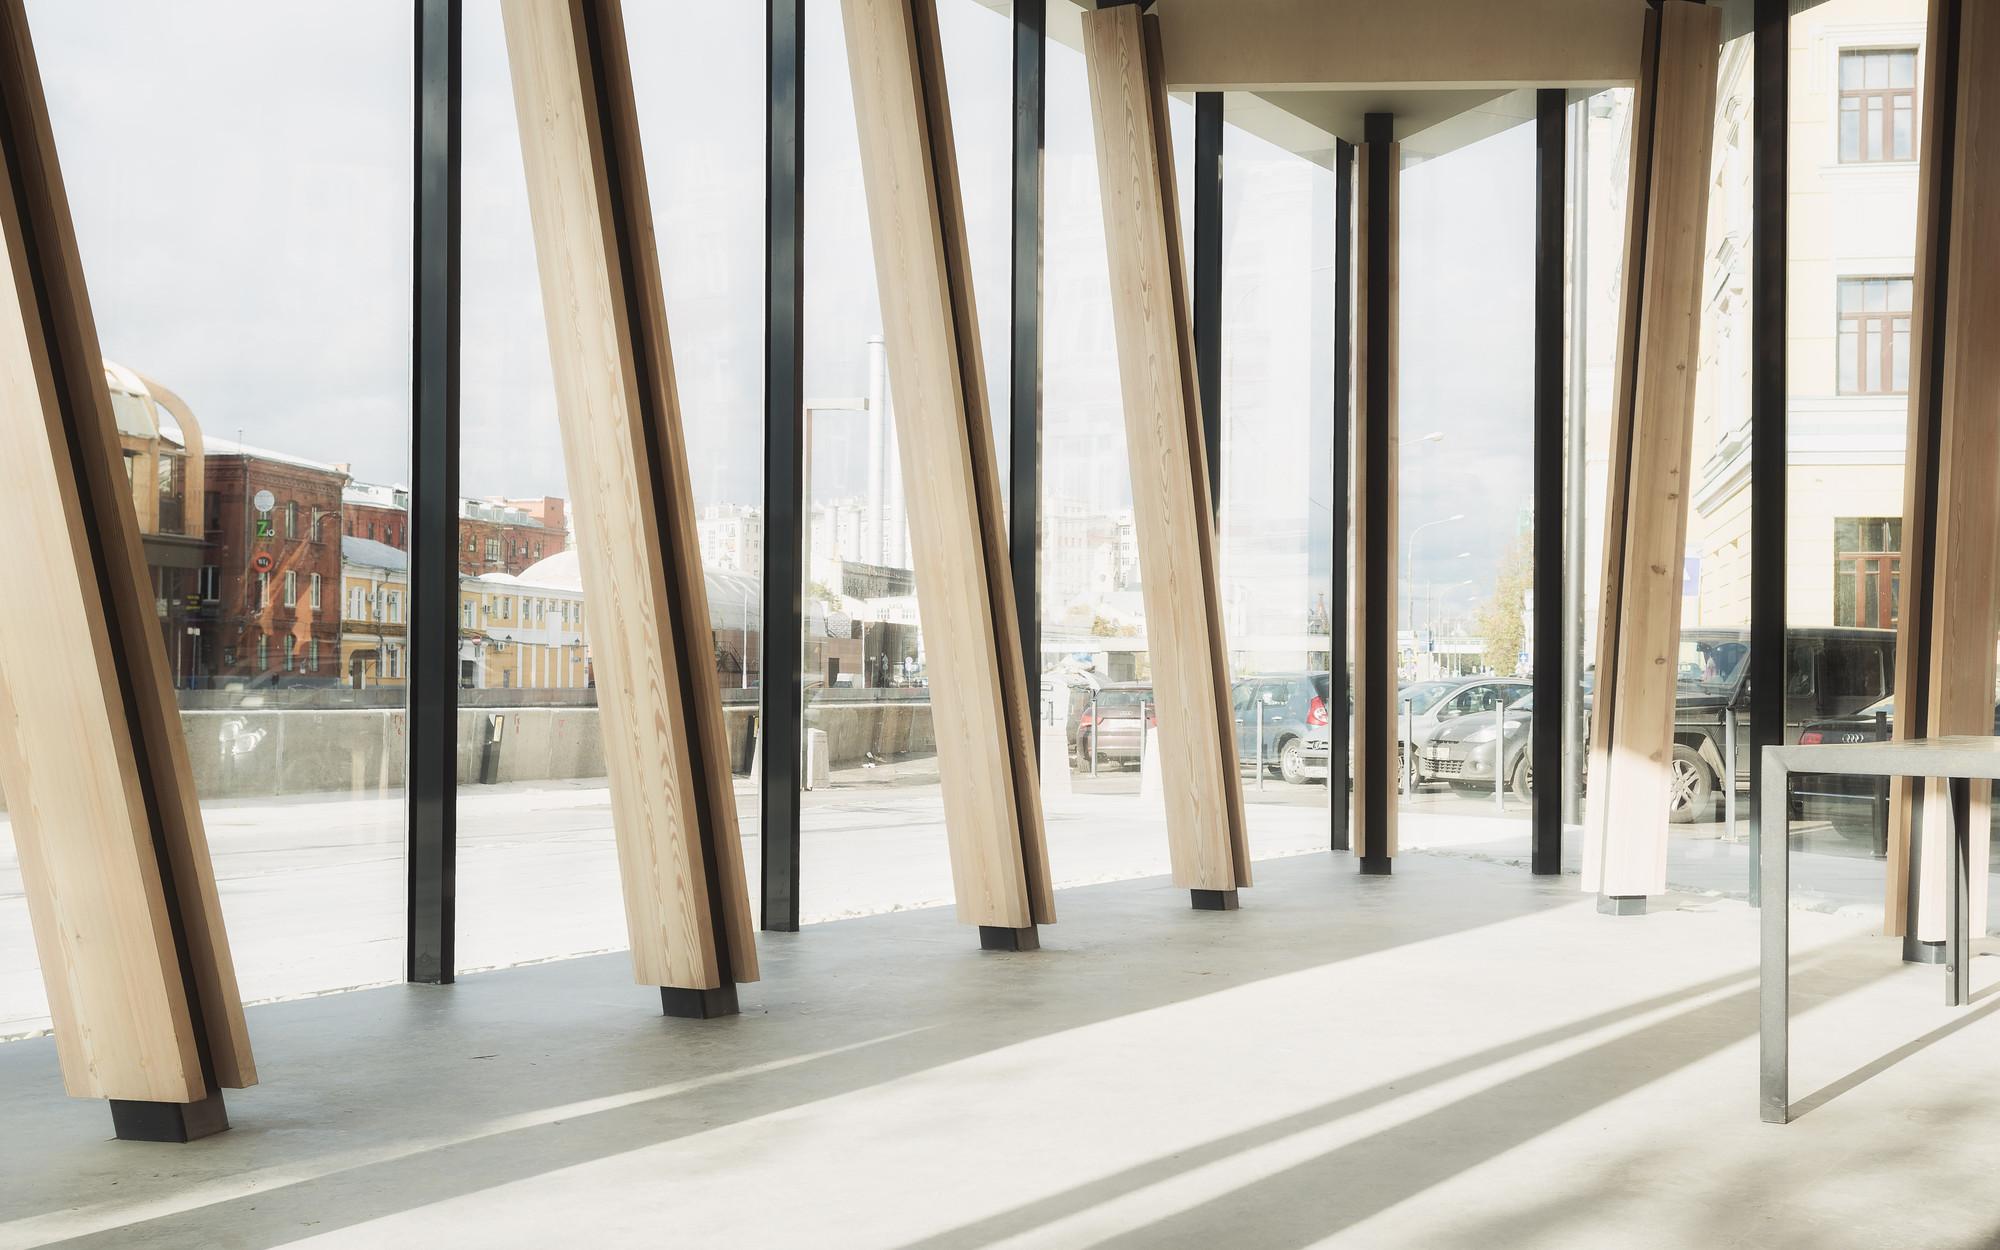 krymskaya embankment wowhaus architecture bureau archdaily. Black Bedroom Furniture Sets. Home Design Ideas